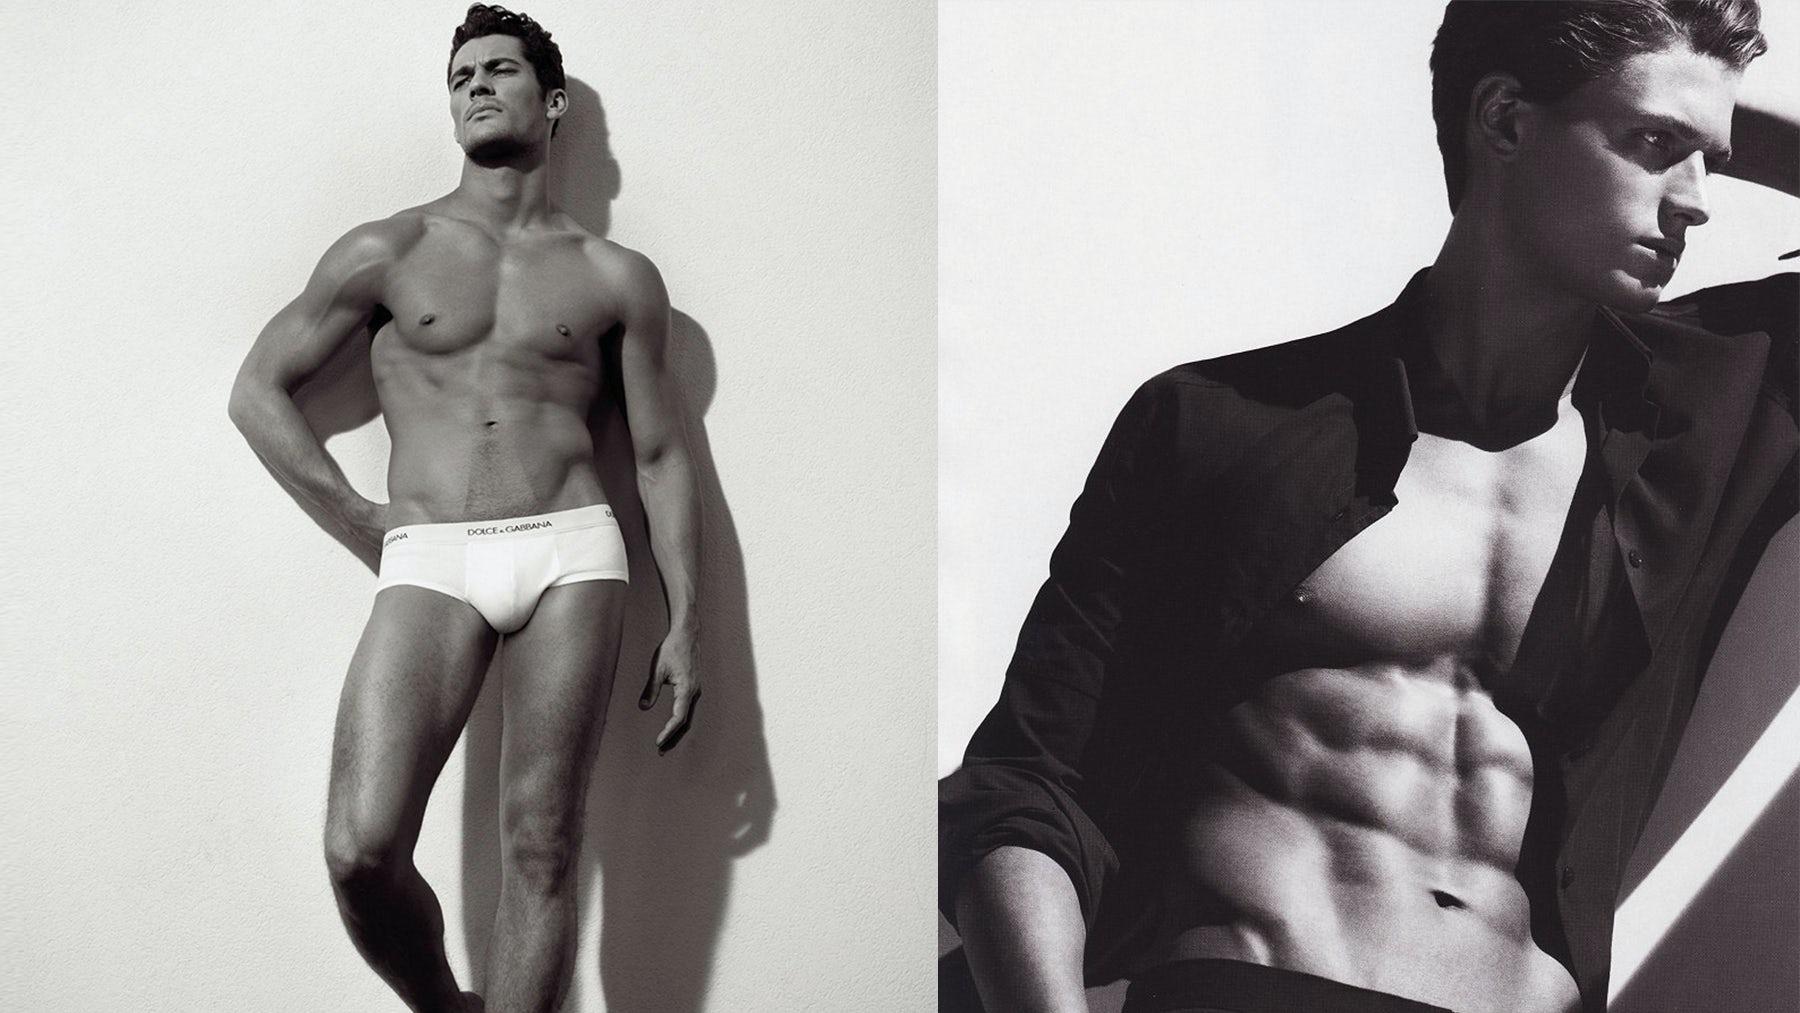 David Gandy for Dolce & Gabbana and Garrett Neff for Calvin Klein   Source: BoF